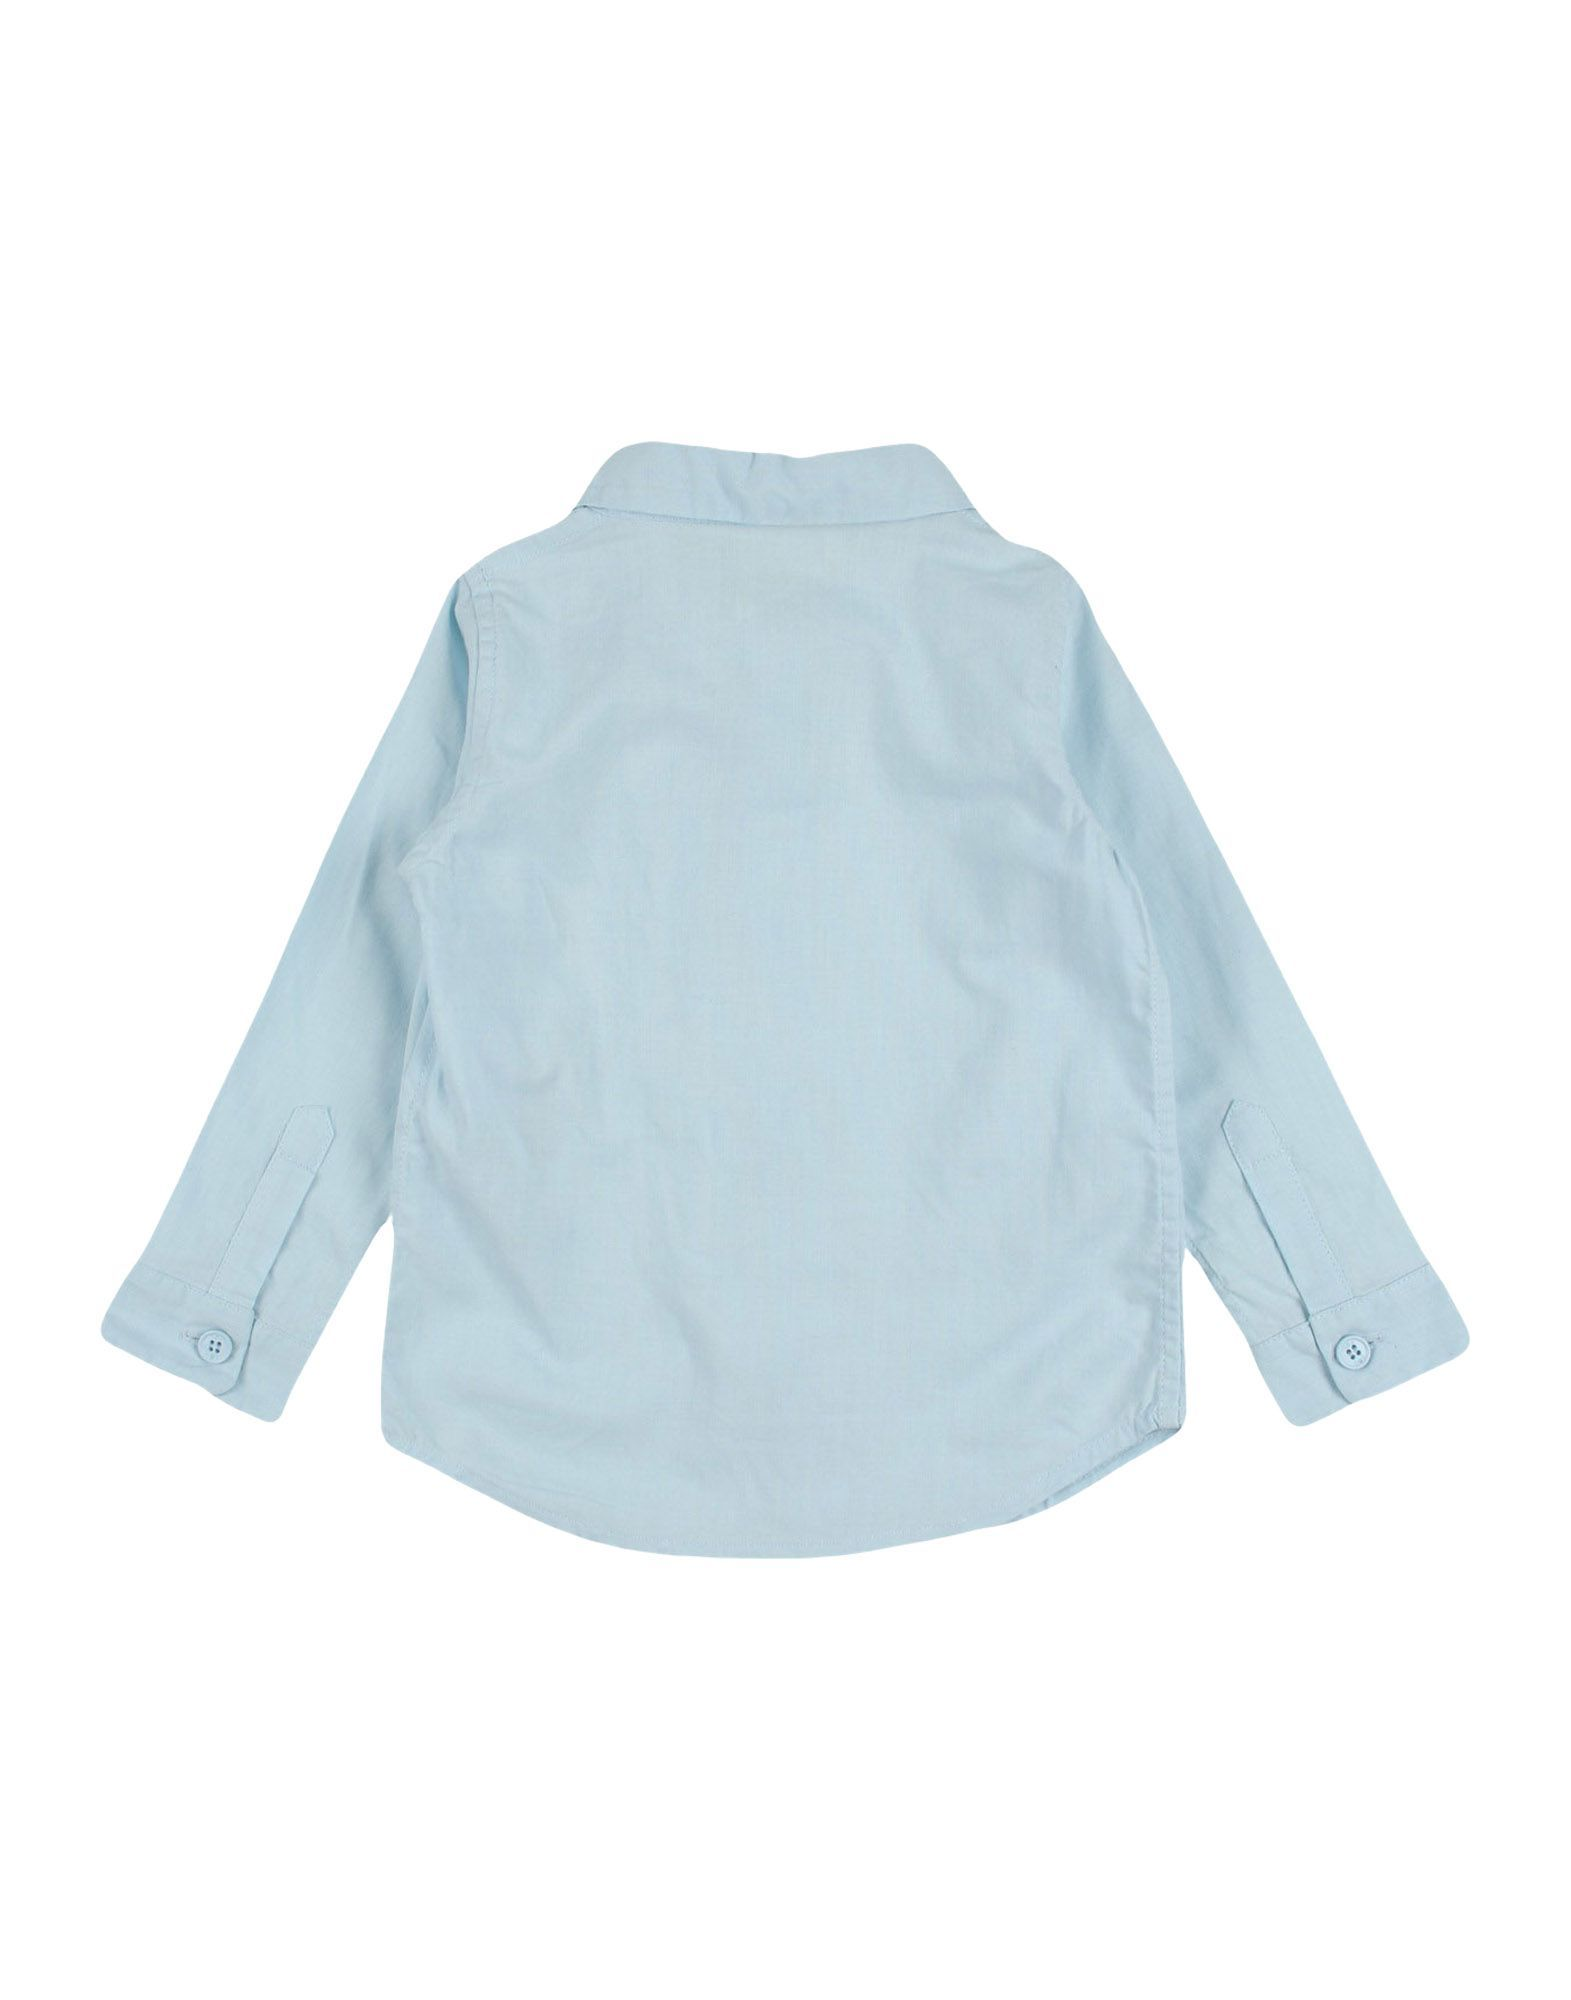 SHIRTS Douuod Sky blue Boy Cotton